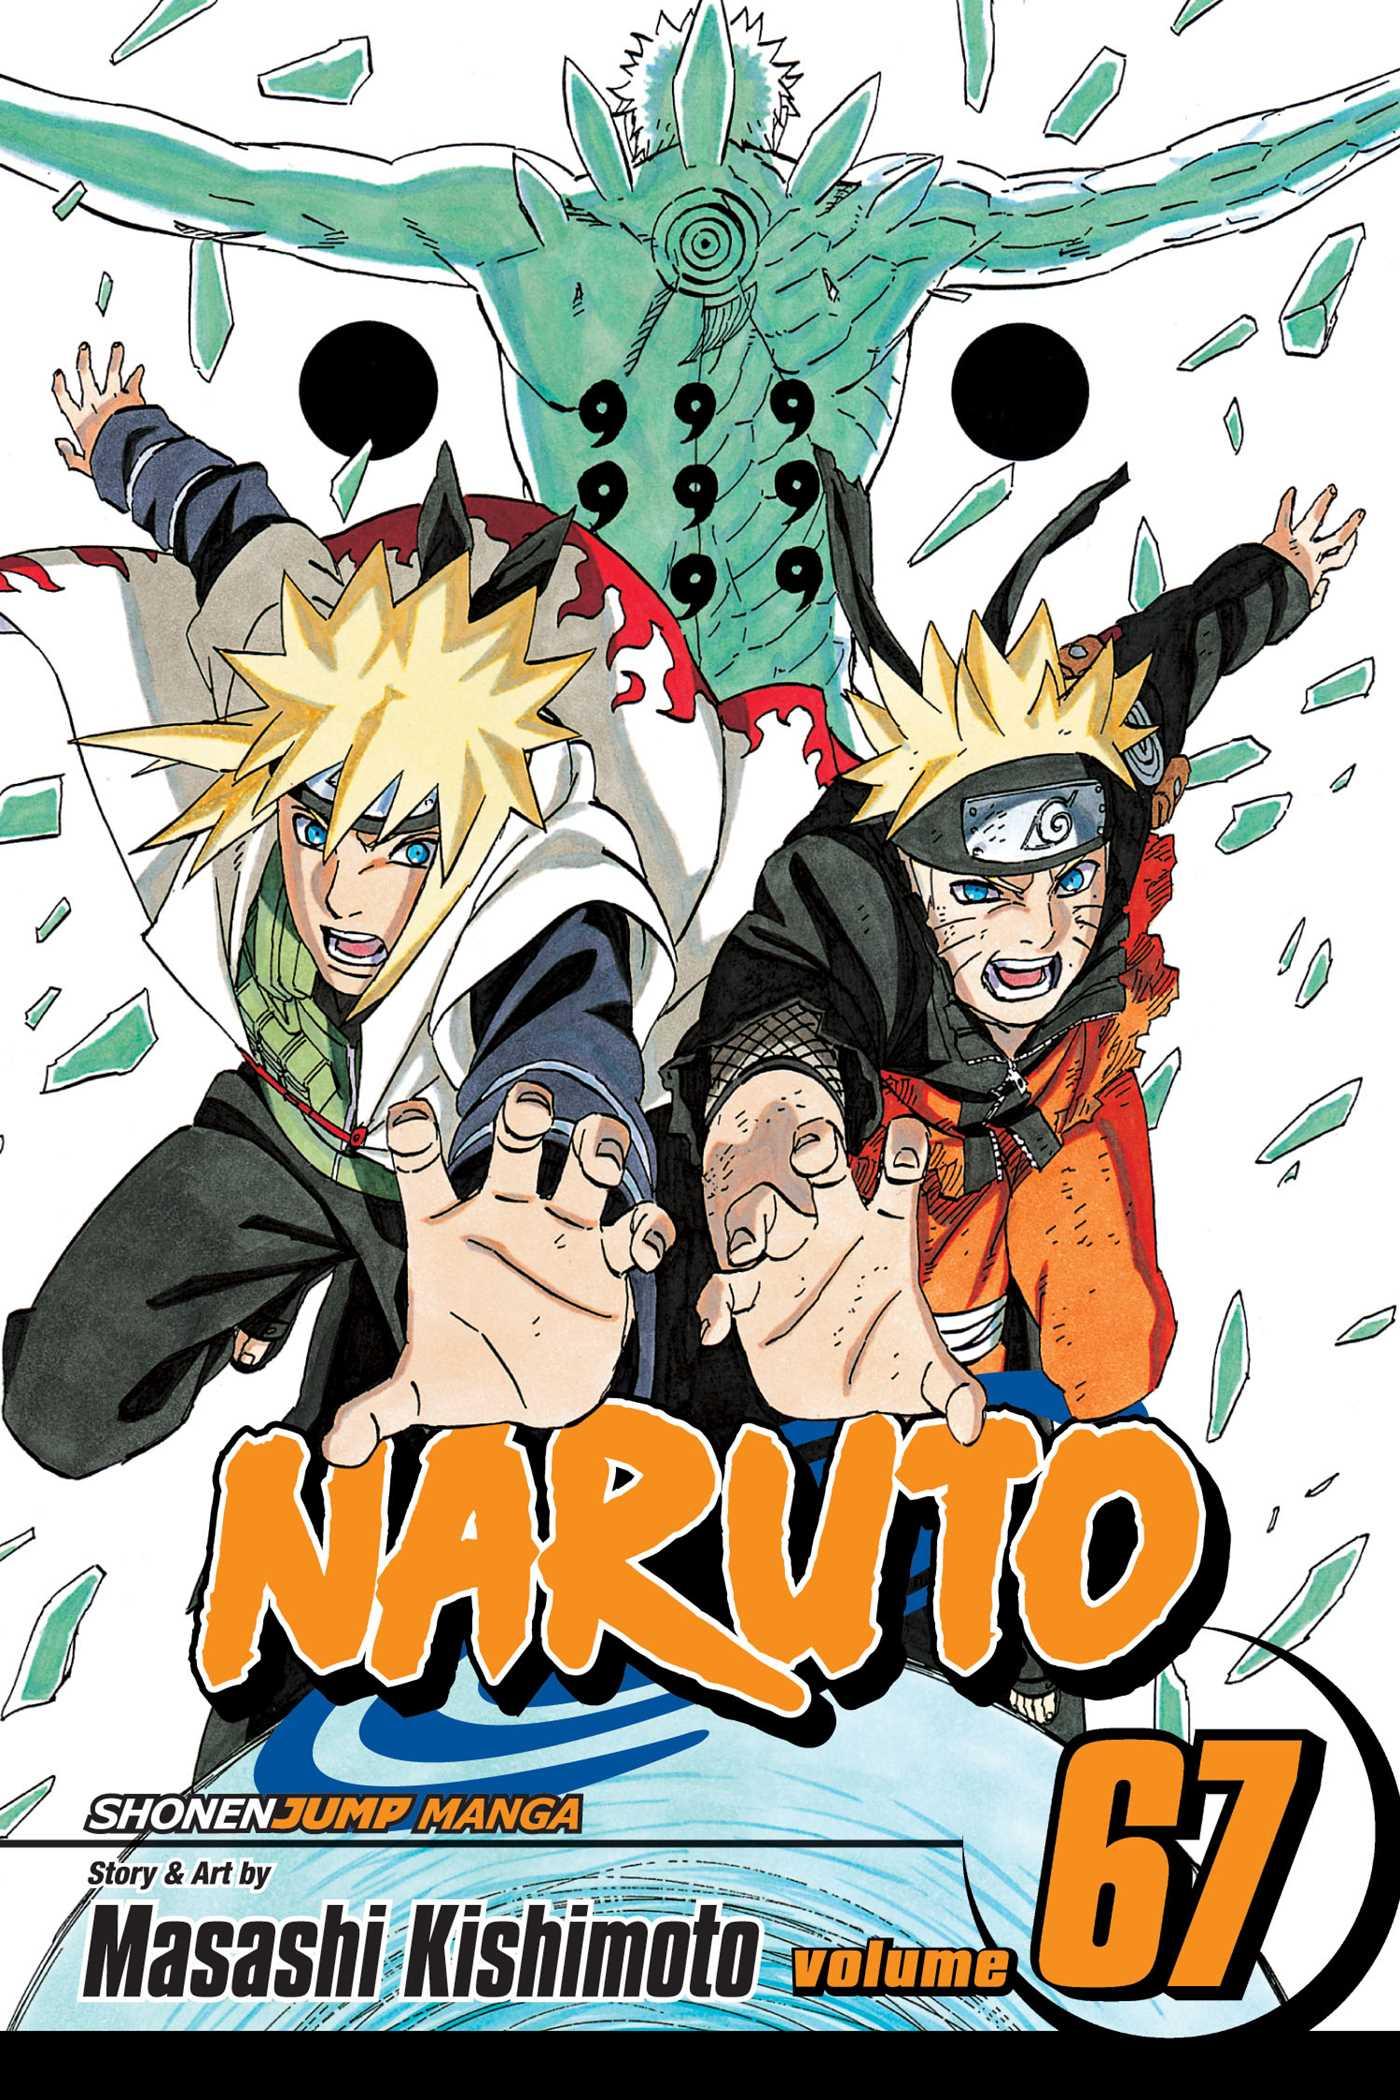 Naruto vol 67 9781421573847 hr